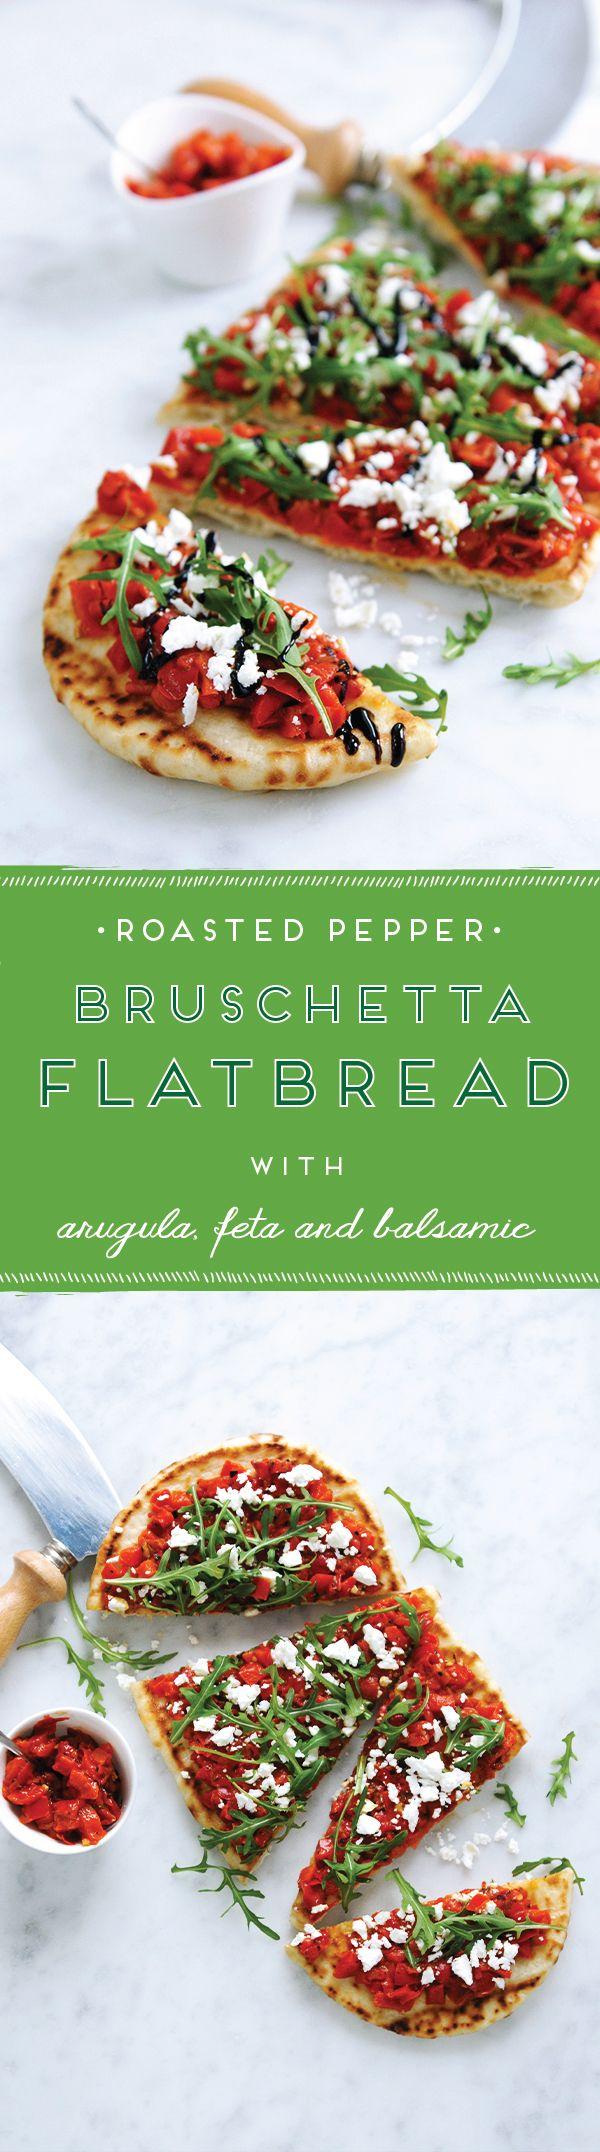 Delish! // Roasted Pepper Bruschetta Flatbread with Feta & Balsamic